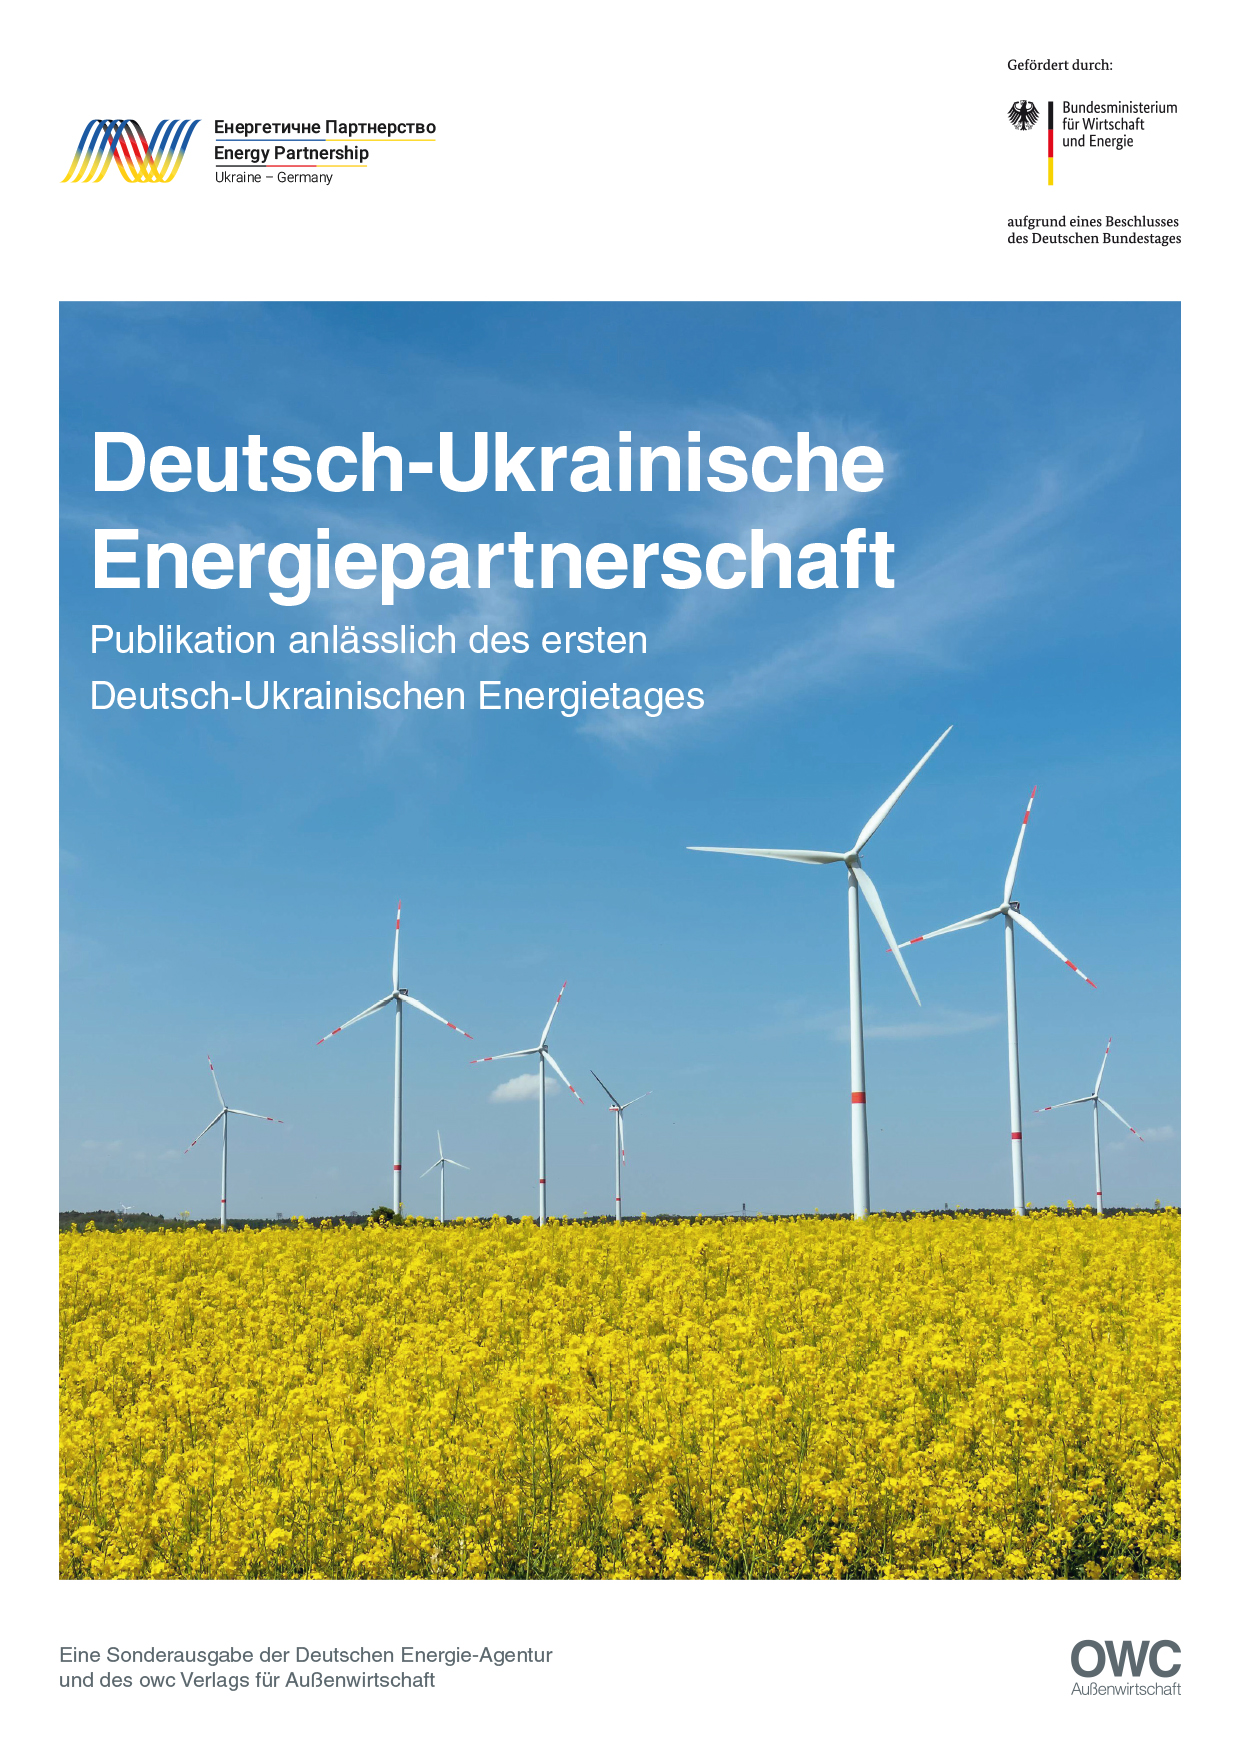 https://owc.de/wp-content/uploads/2021/01/dena-2020_cover.jpg